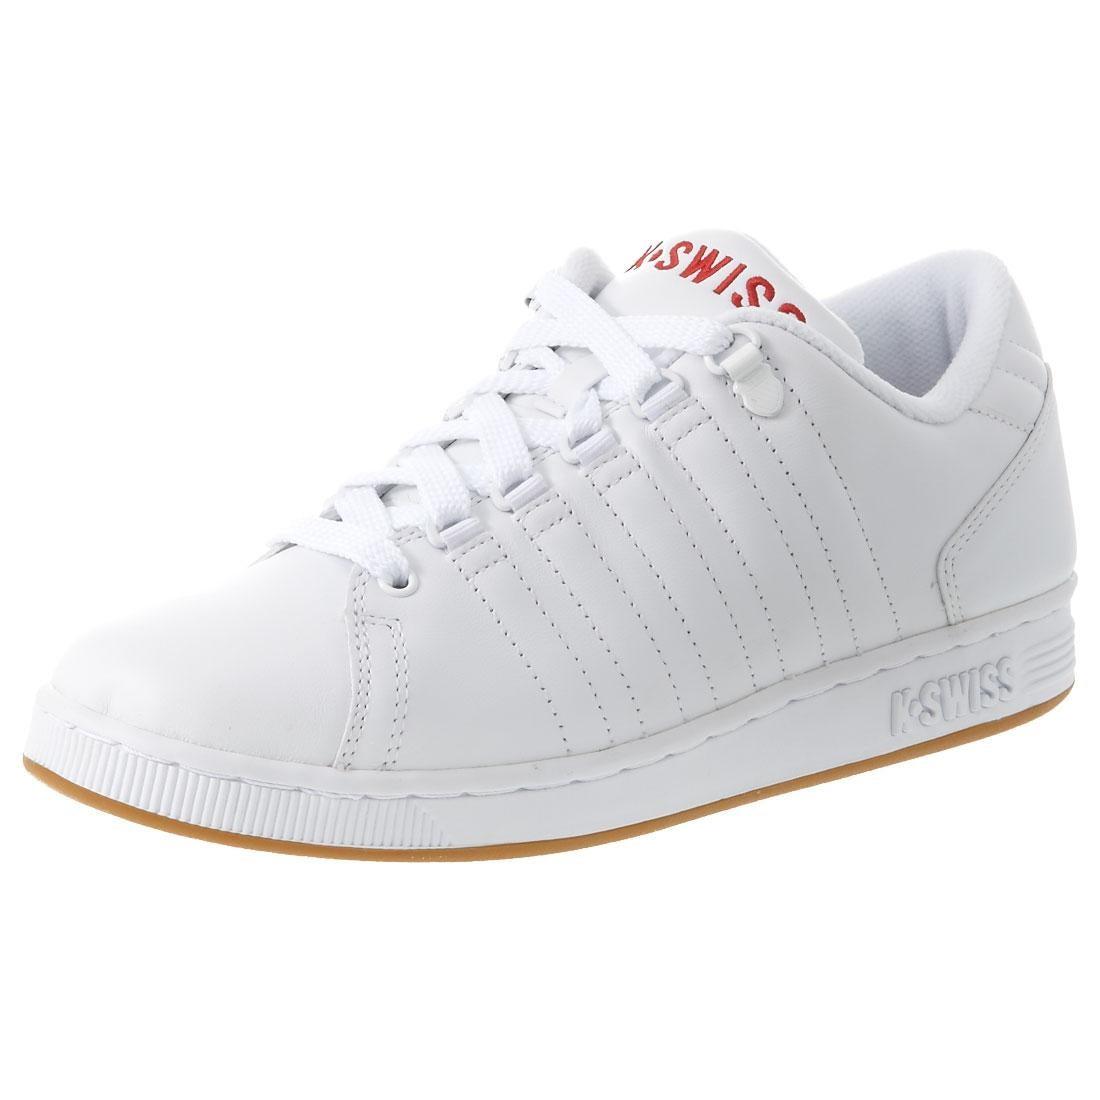 KSWISS ケースイス ロザン / K・SWISS LOZAN(ホワイト) ,靴とファッションの通販サイト ロコンド